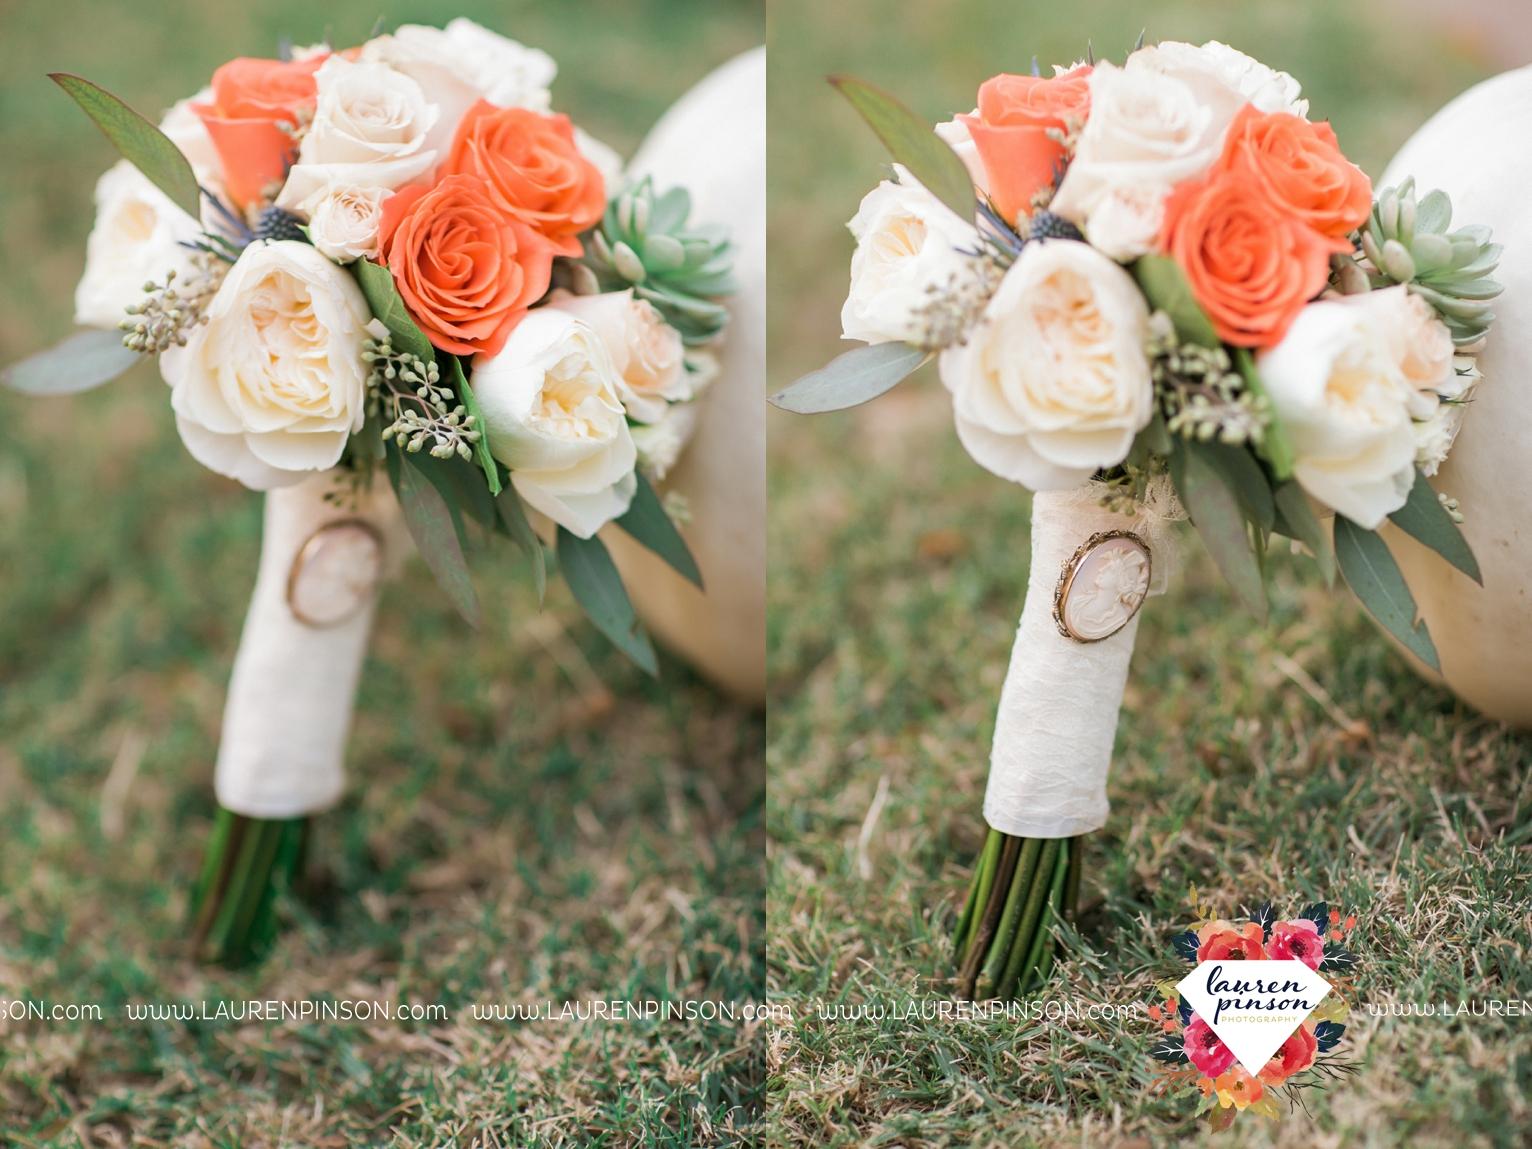 kemp-center-for-the-arts-wichita-falls-texas-wedding-photographer-fall-wedding-pumpkins-137.jpg